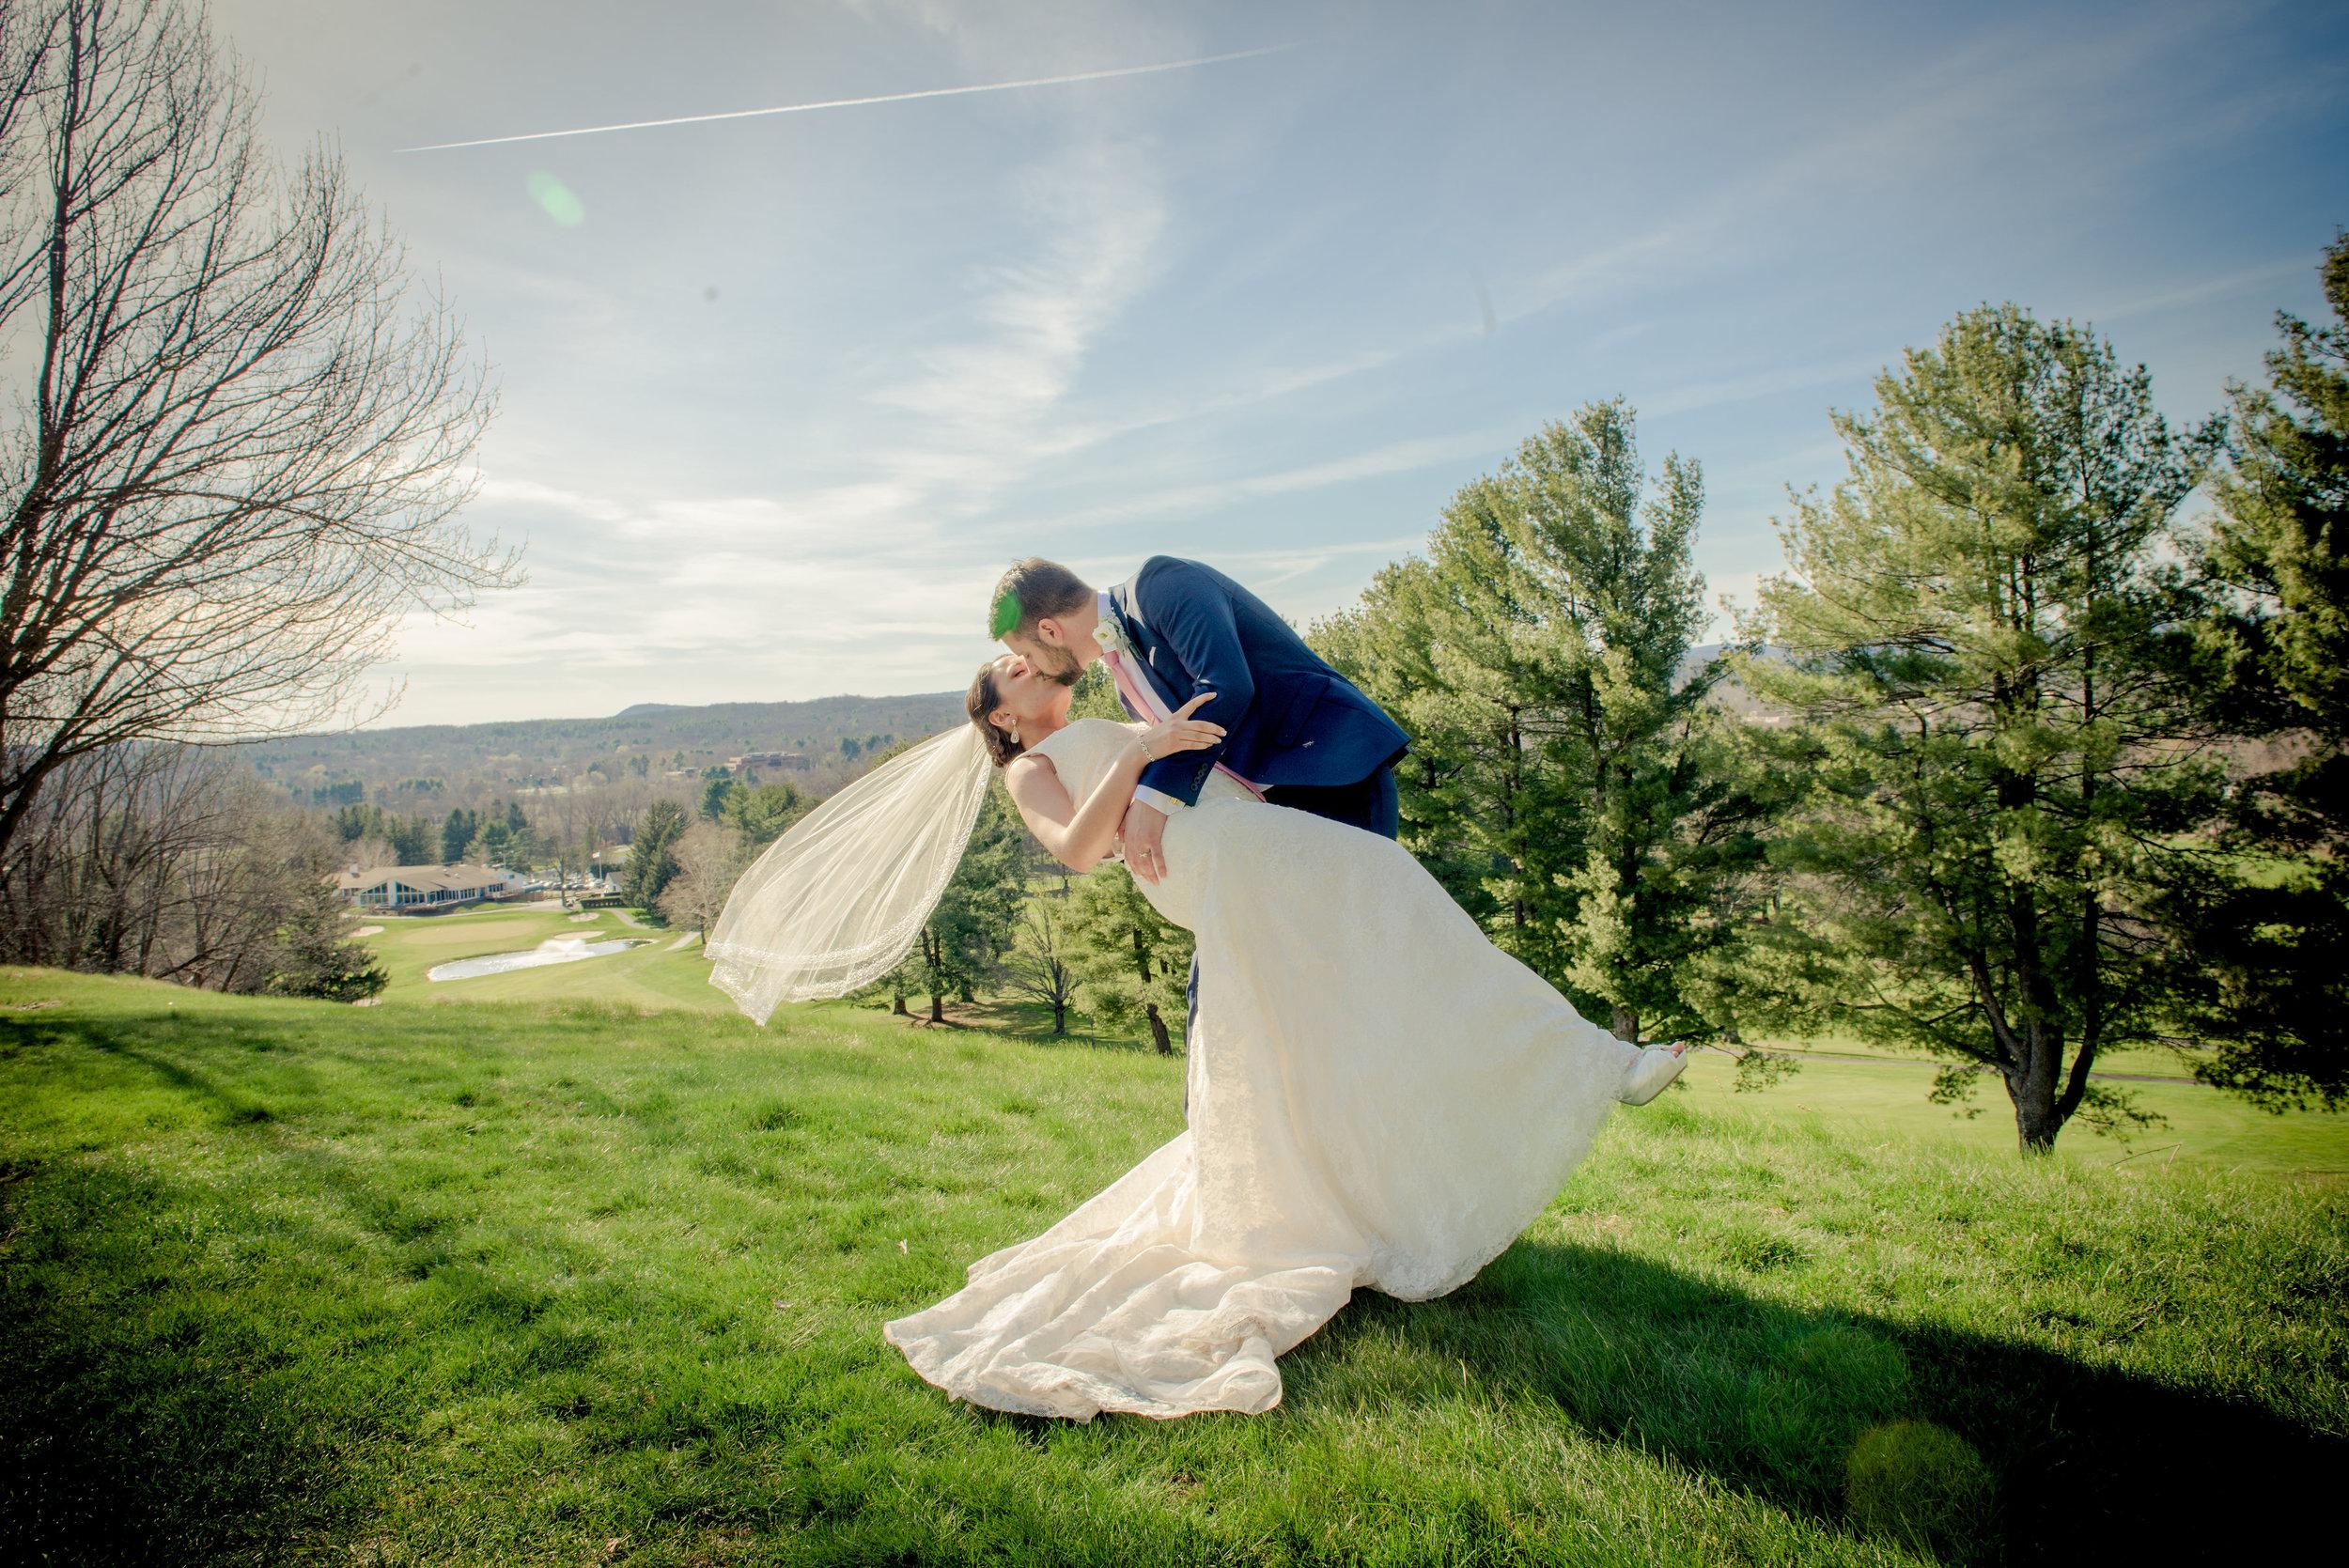 Kasia & Phil  Tower Ridge Country Club, Avon CT